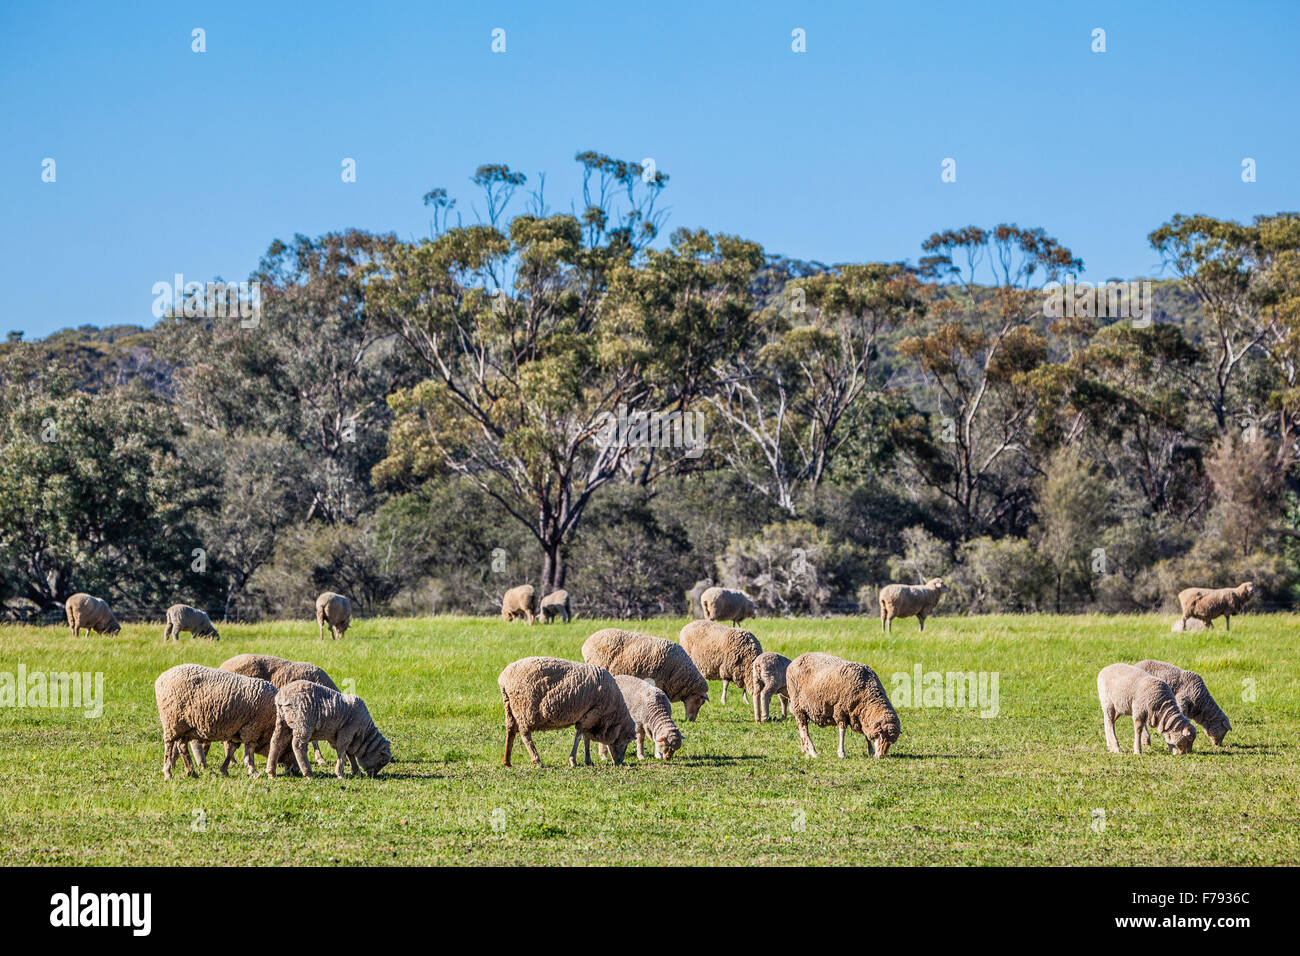 Australia, Western Australia, Wheatbelt Region, Shire of Victoria Plains, flock of Merino sheep at New Norcia - Stock Image